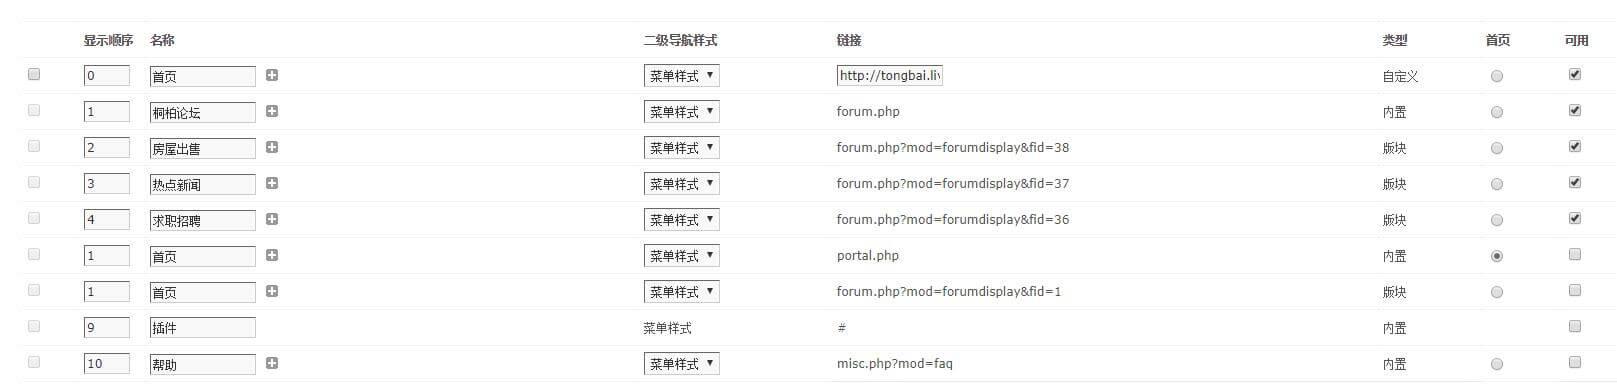 discuz X3.4删除门户后缀的portal.php